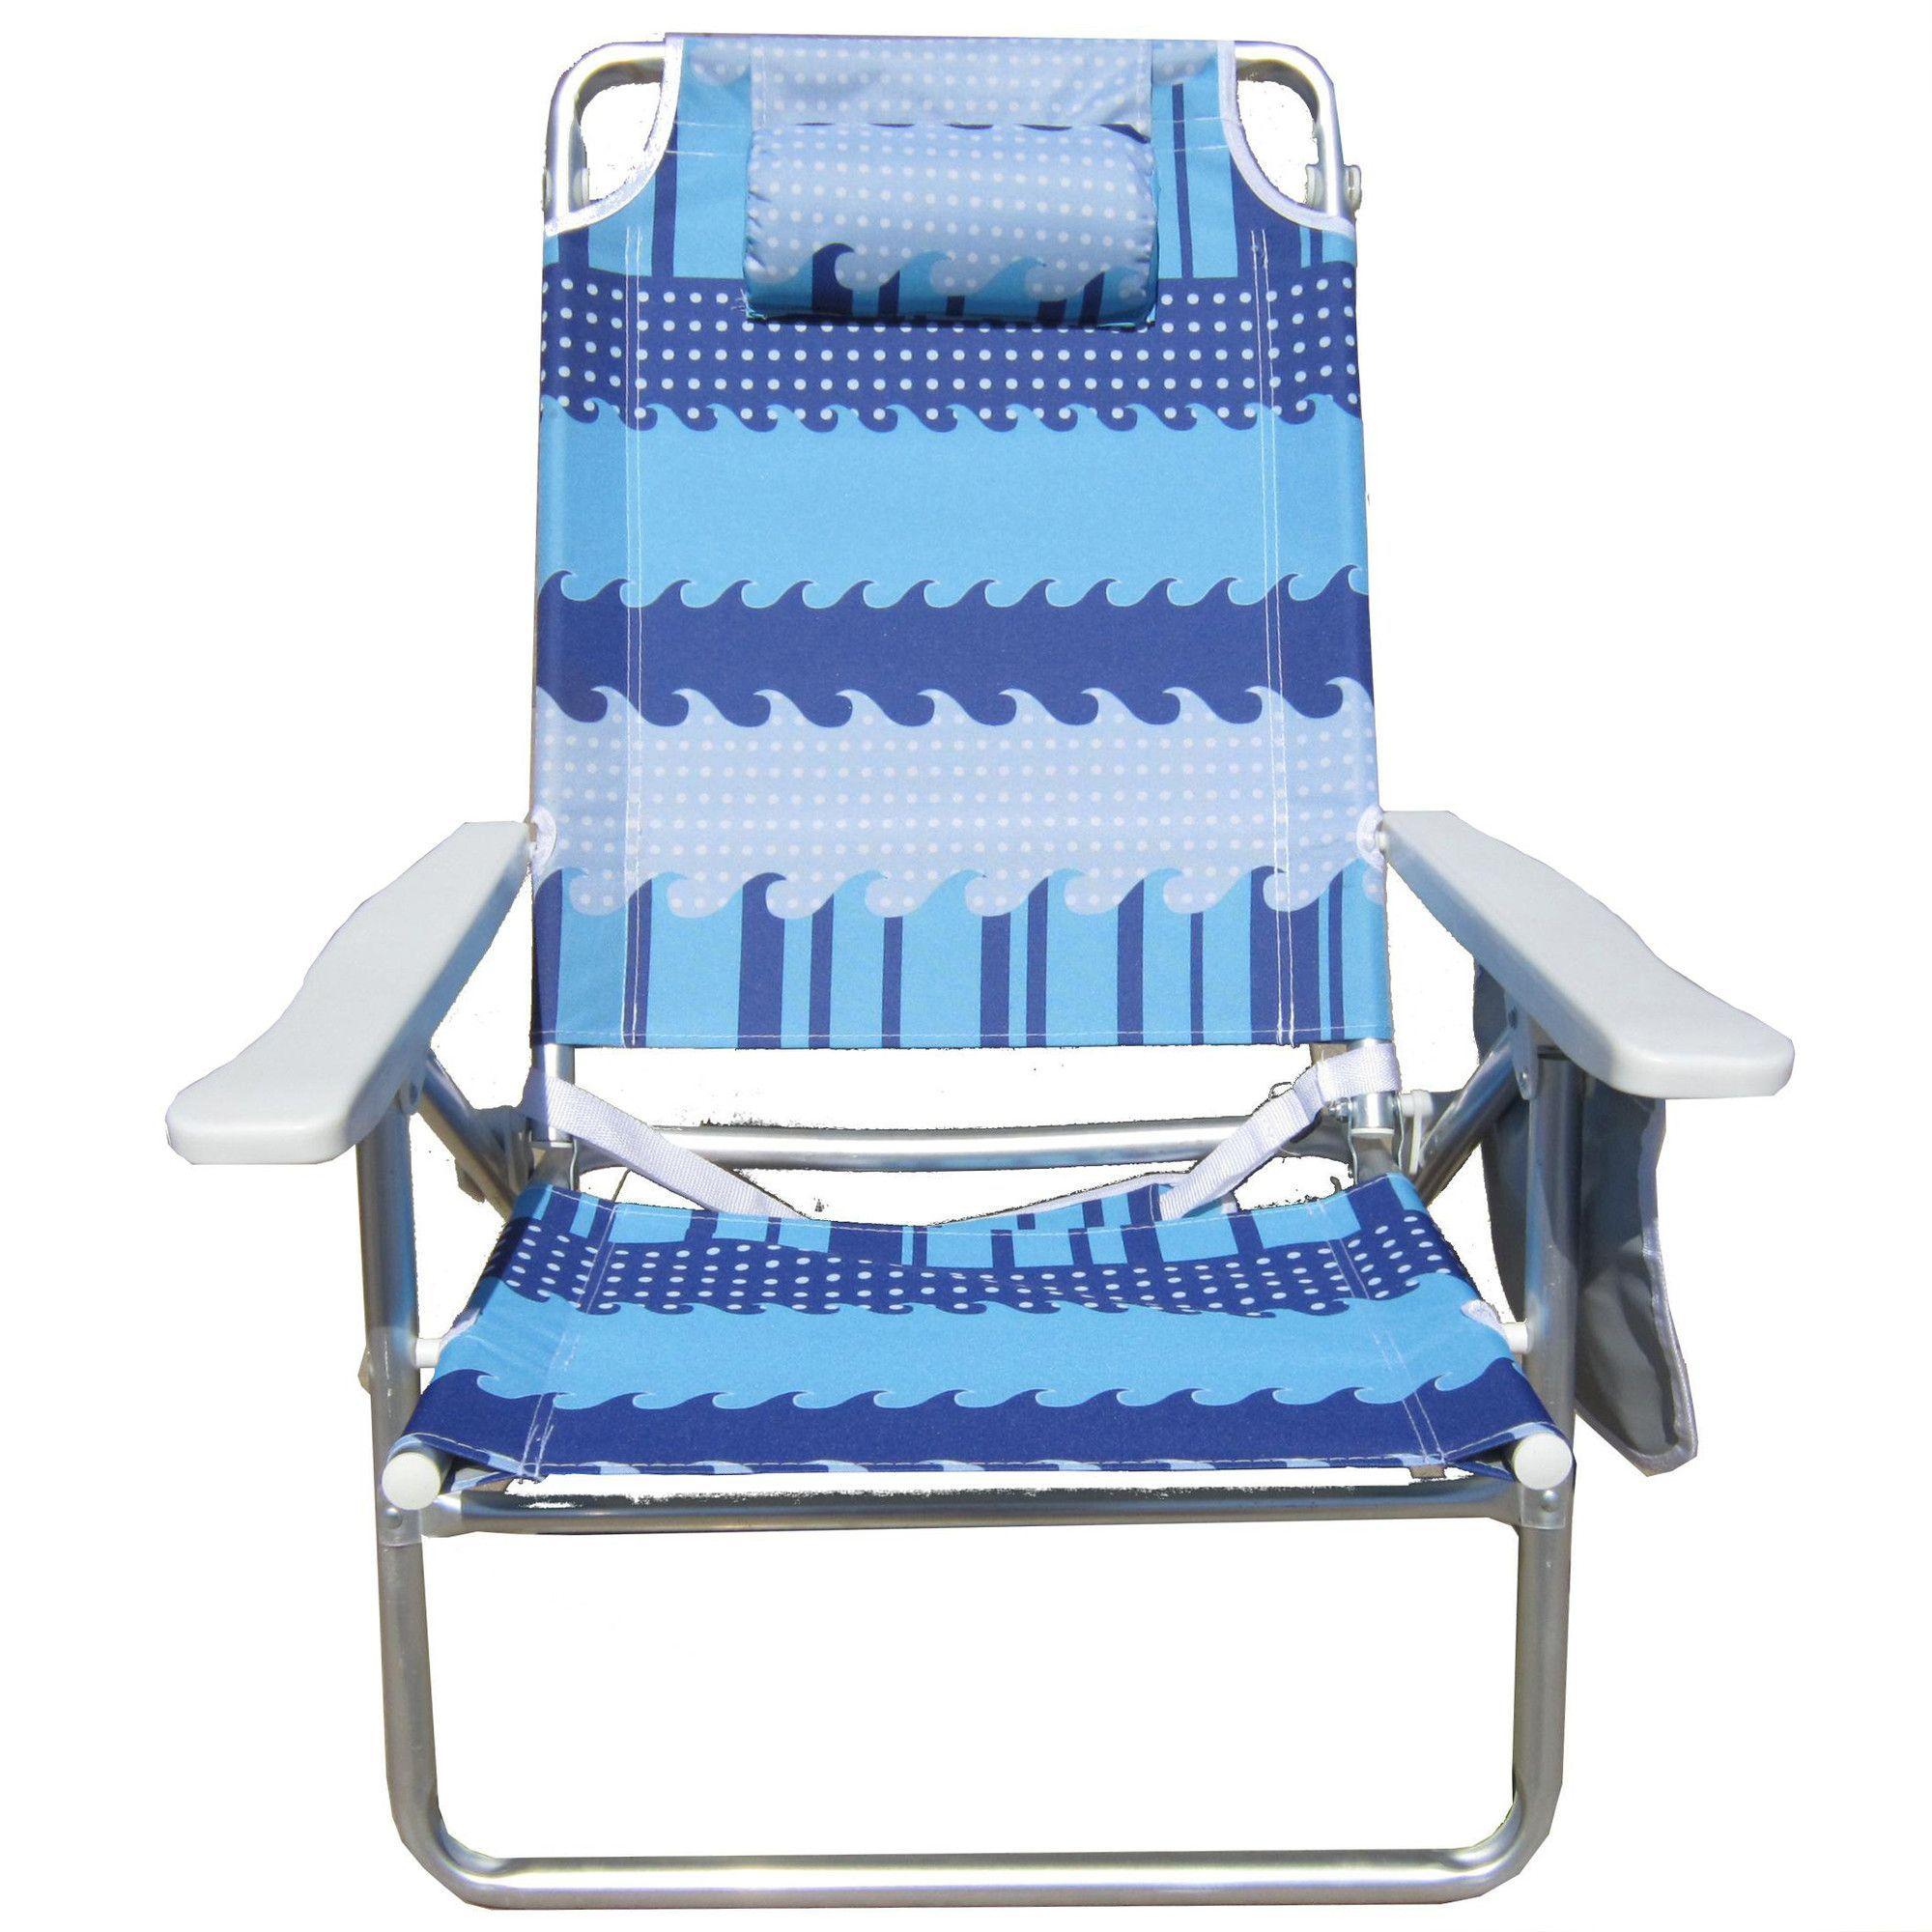 Reclining/Folding Zero Gravity Chair with Cushion